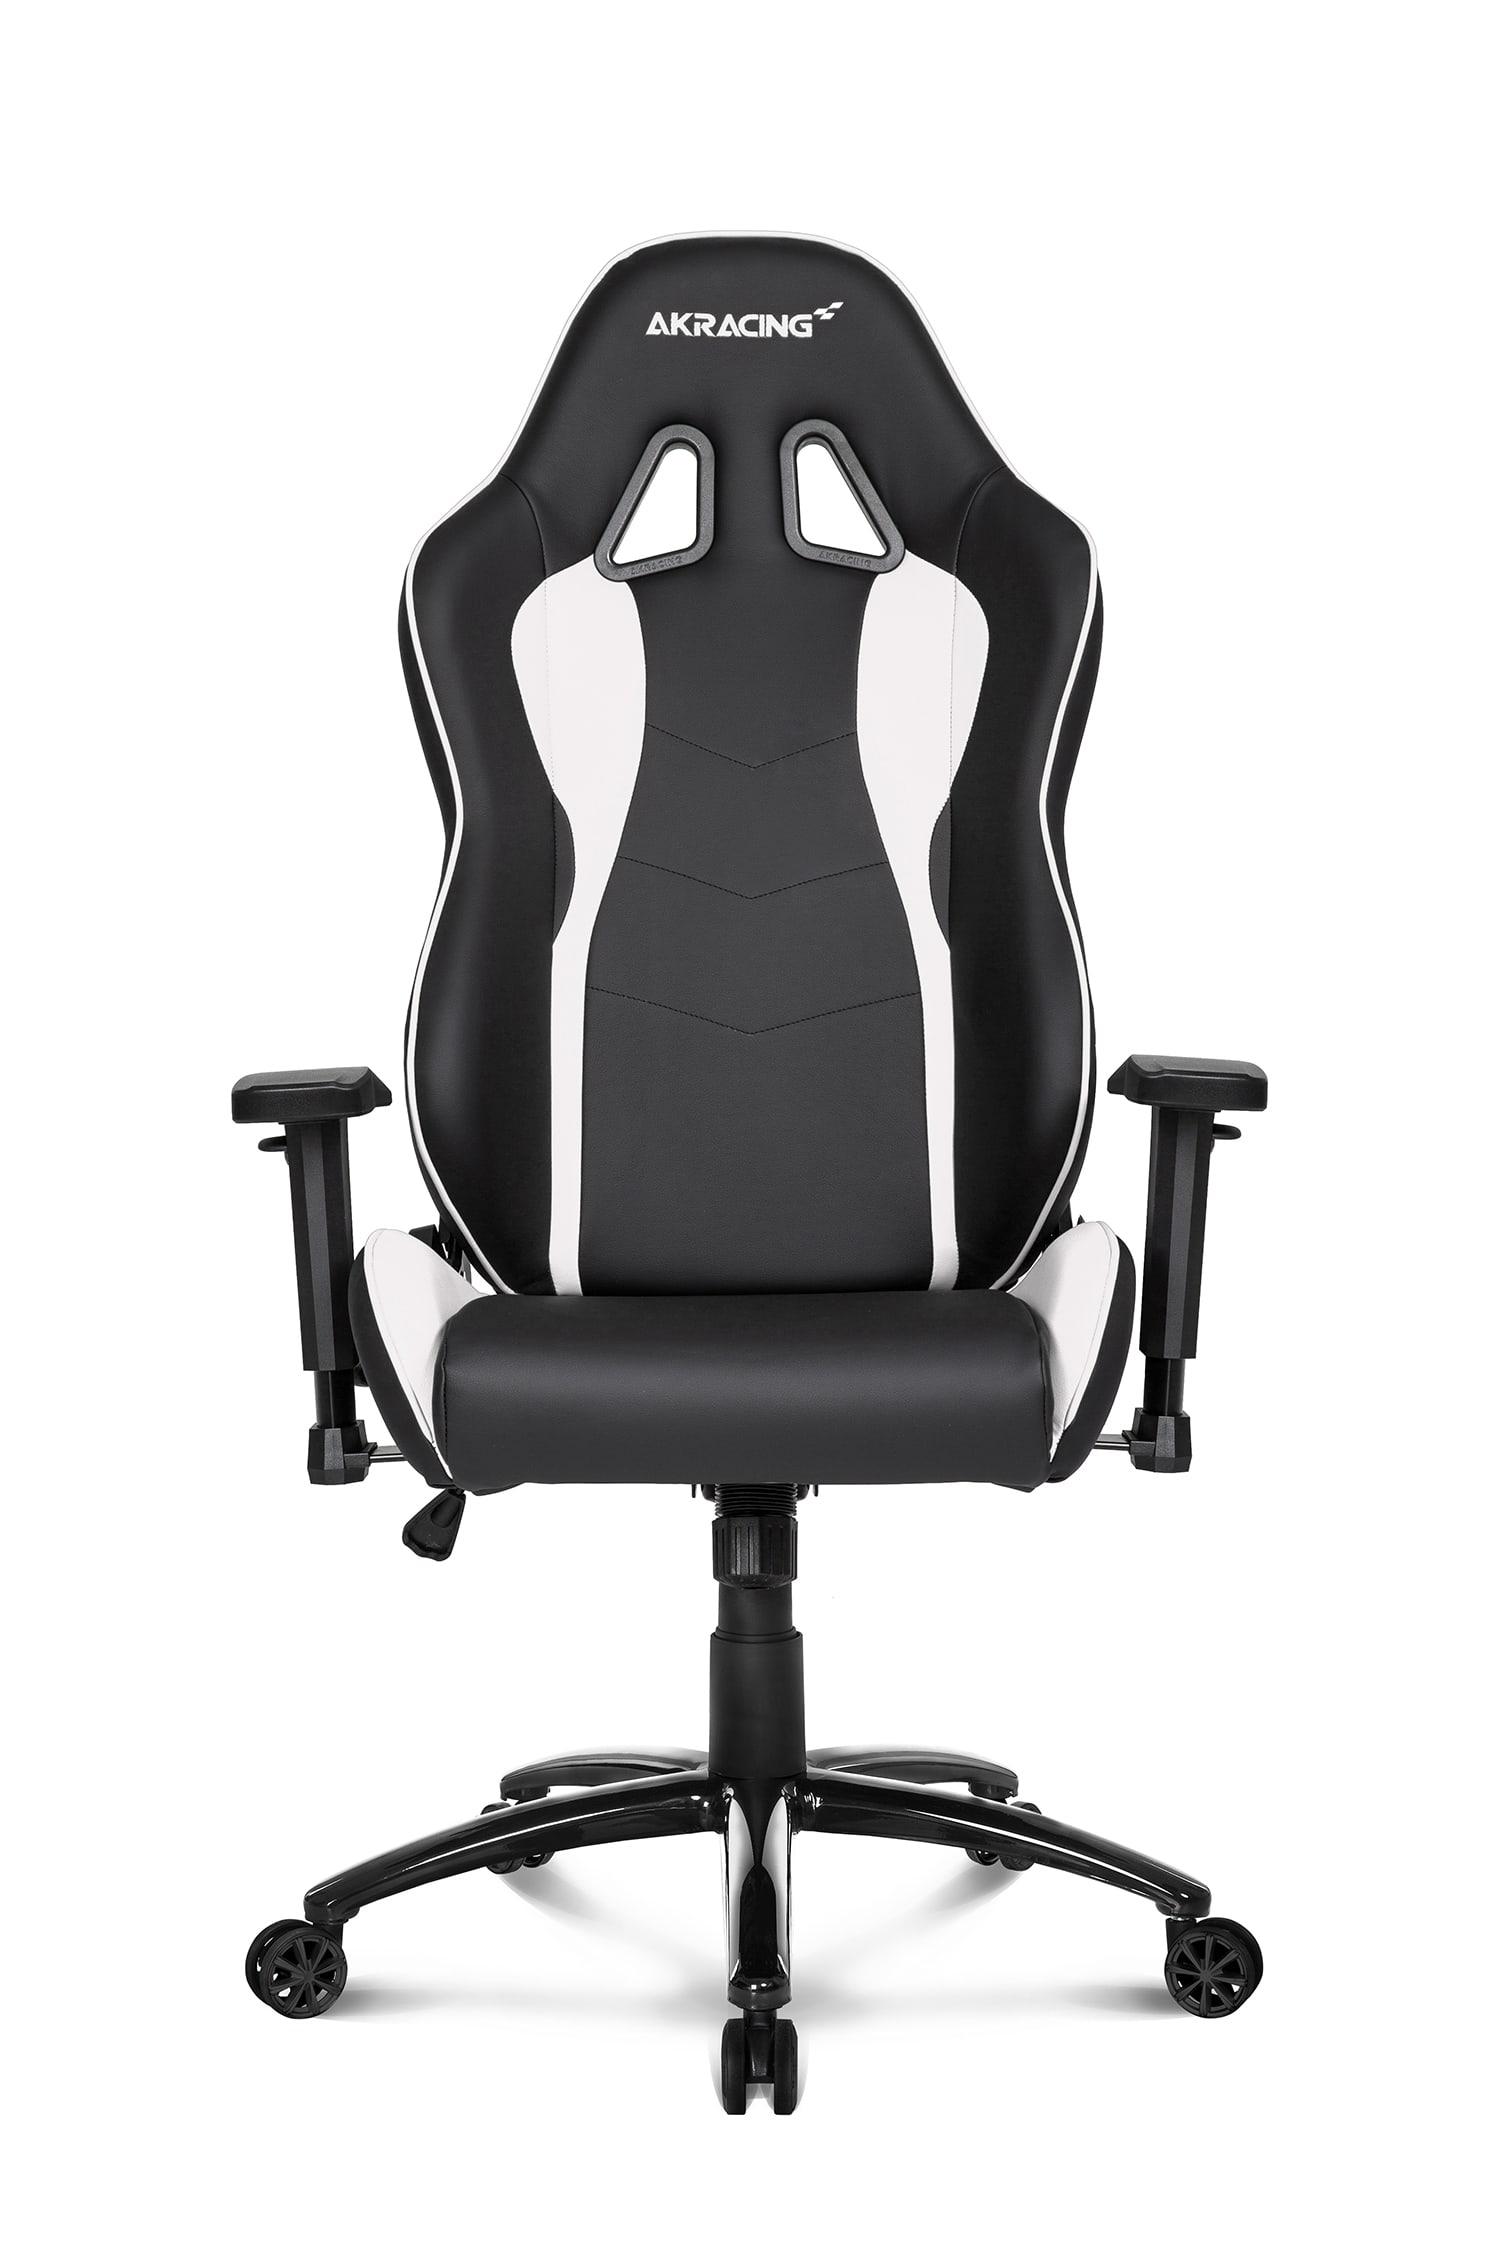 Incredible Akracing Nitro Gaming Chair Black White Ak Nitro Wt Theyellowbook Wood Chair Design Ideas Theyellowbookinfo